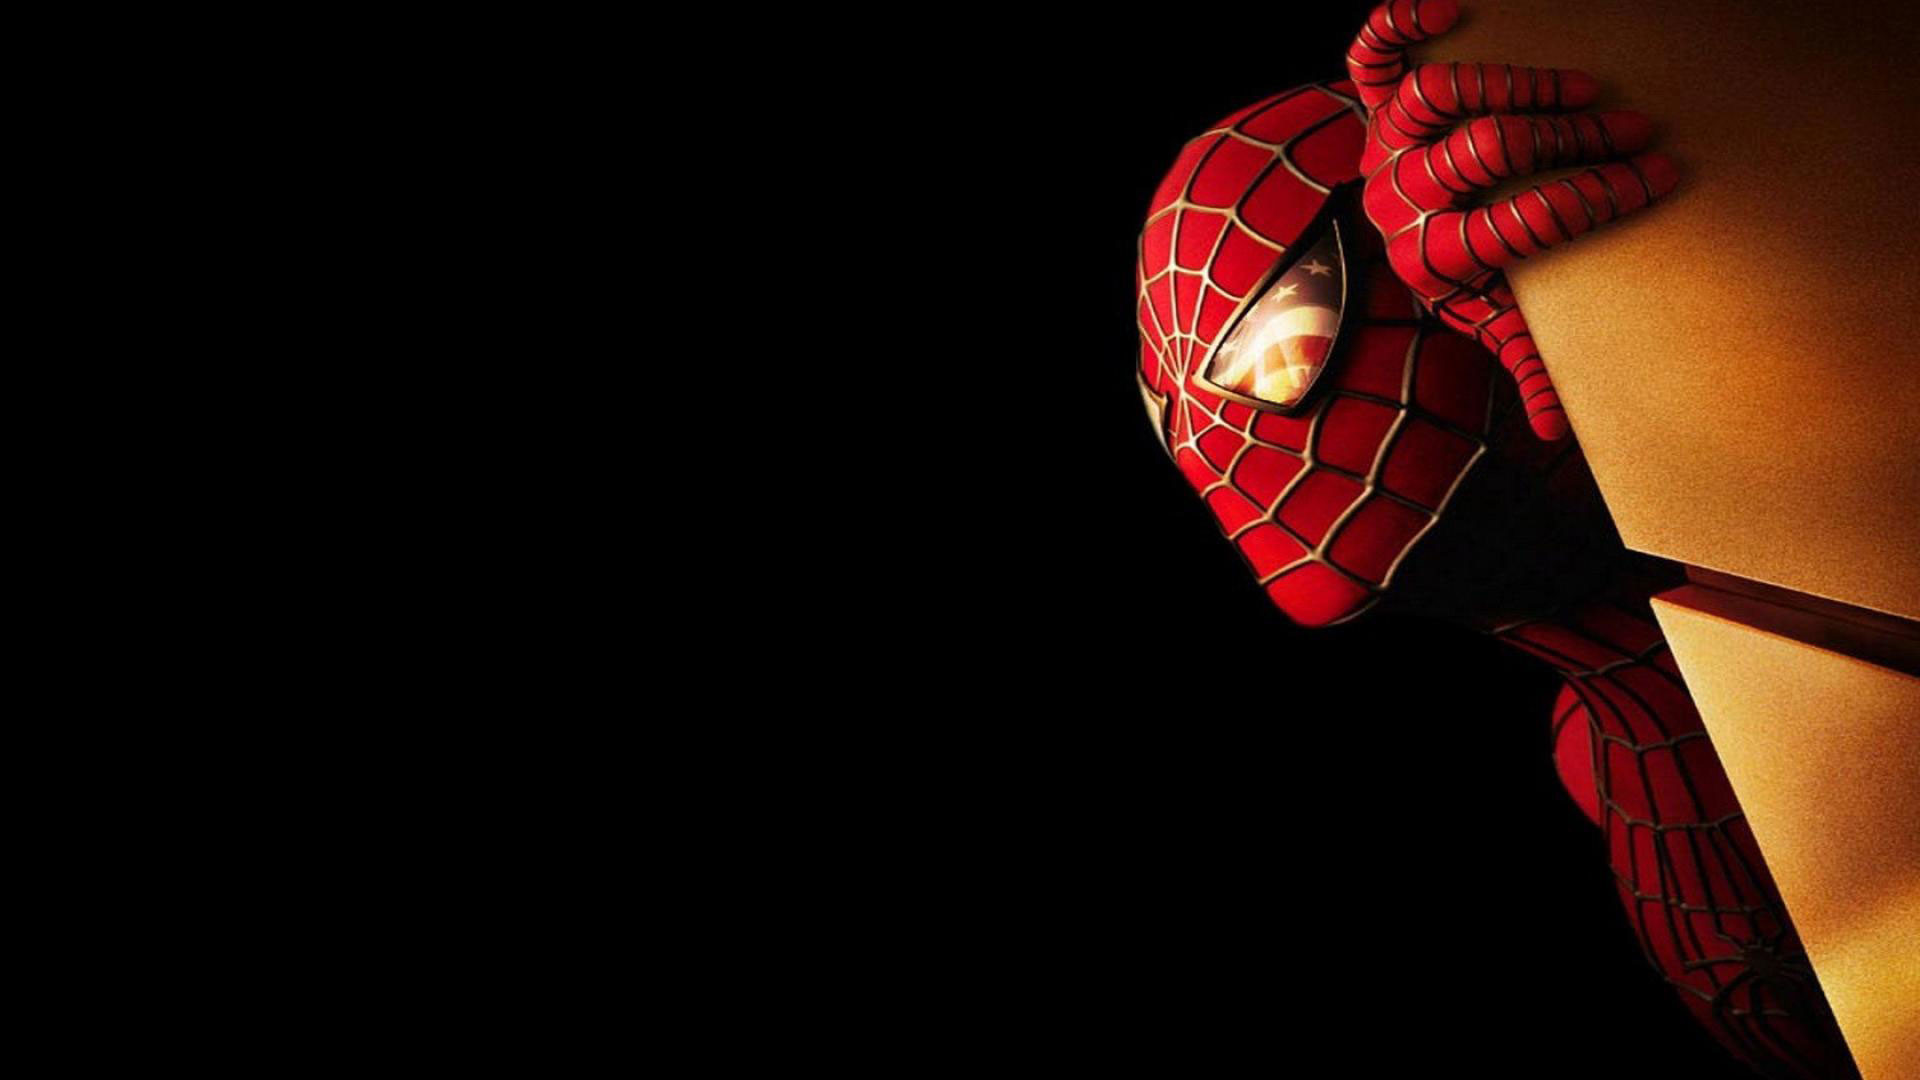 Super Hero Wallpapers (77+ images)